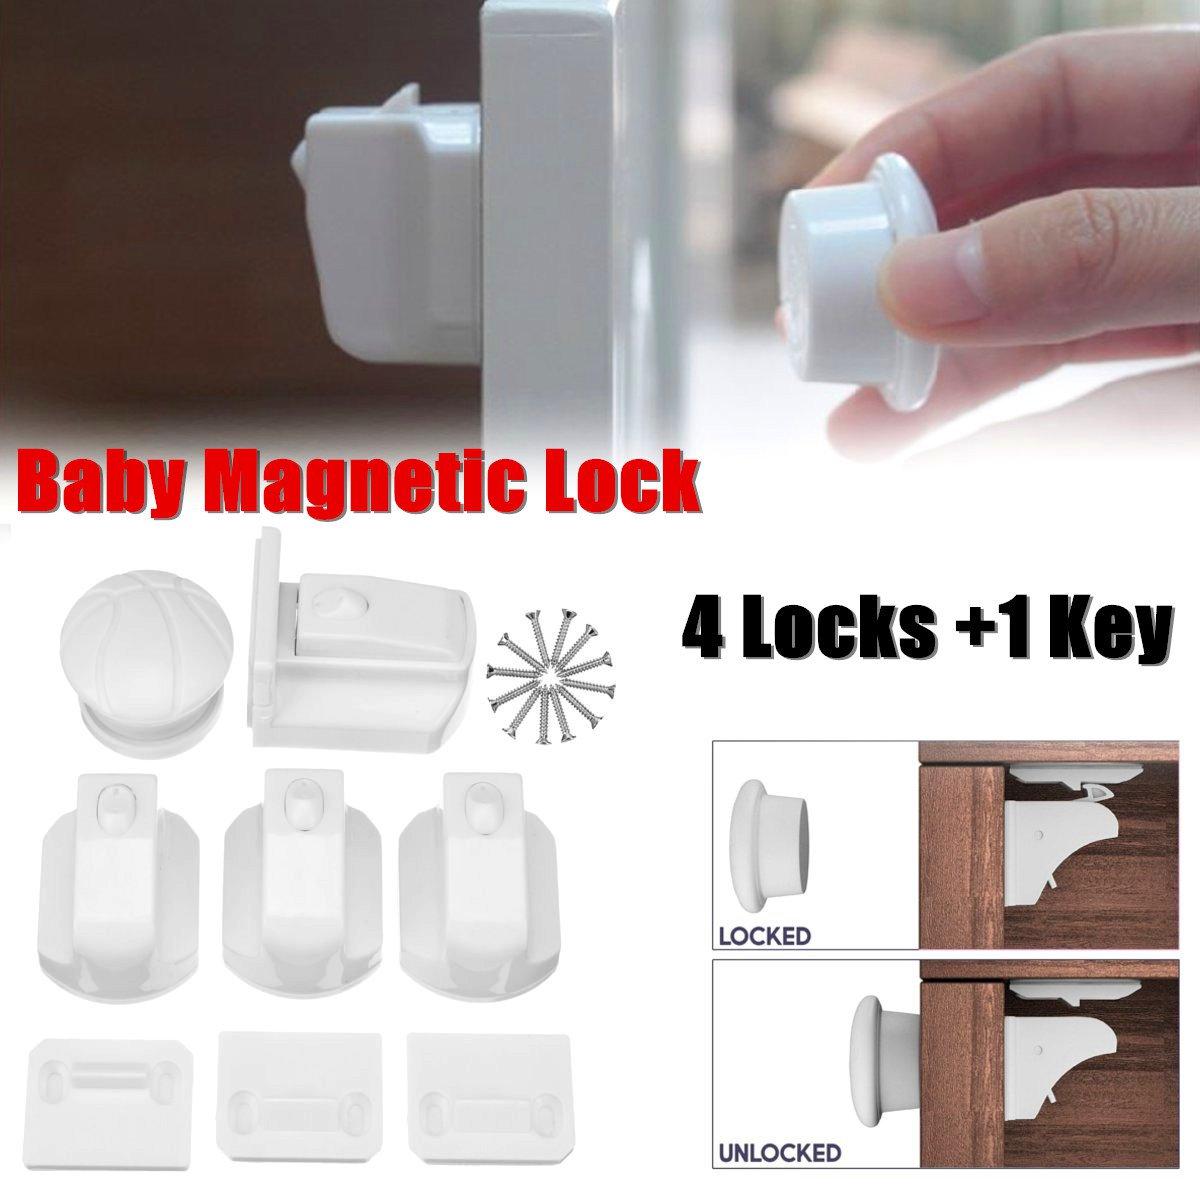 4pcs Magnetic Child Lock Baby Cabinet Safety Locks Kids Armario Drawer Locker Security Latches Cupboard